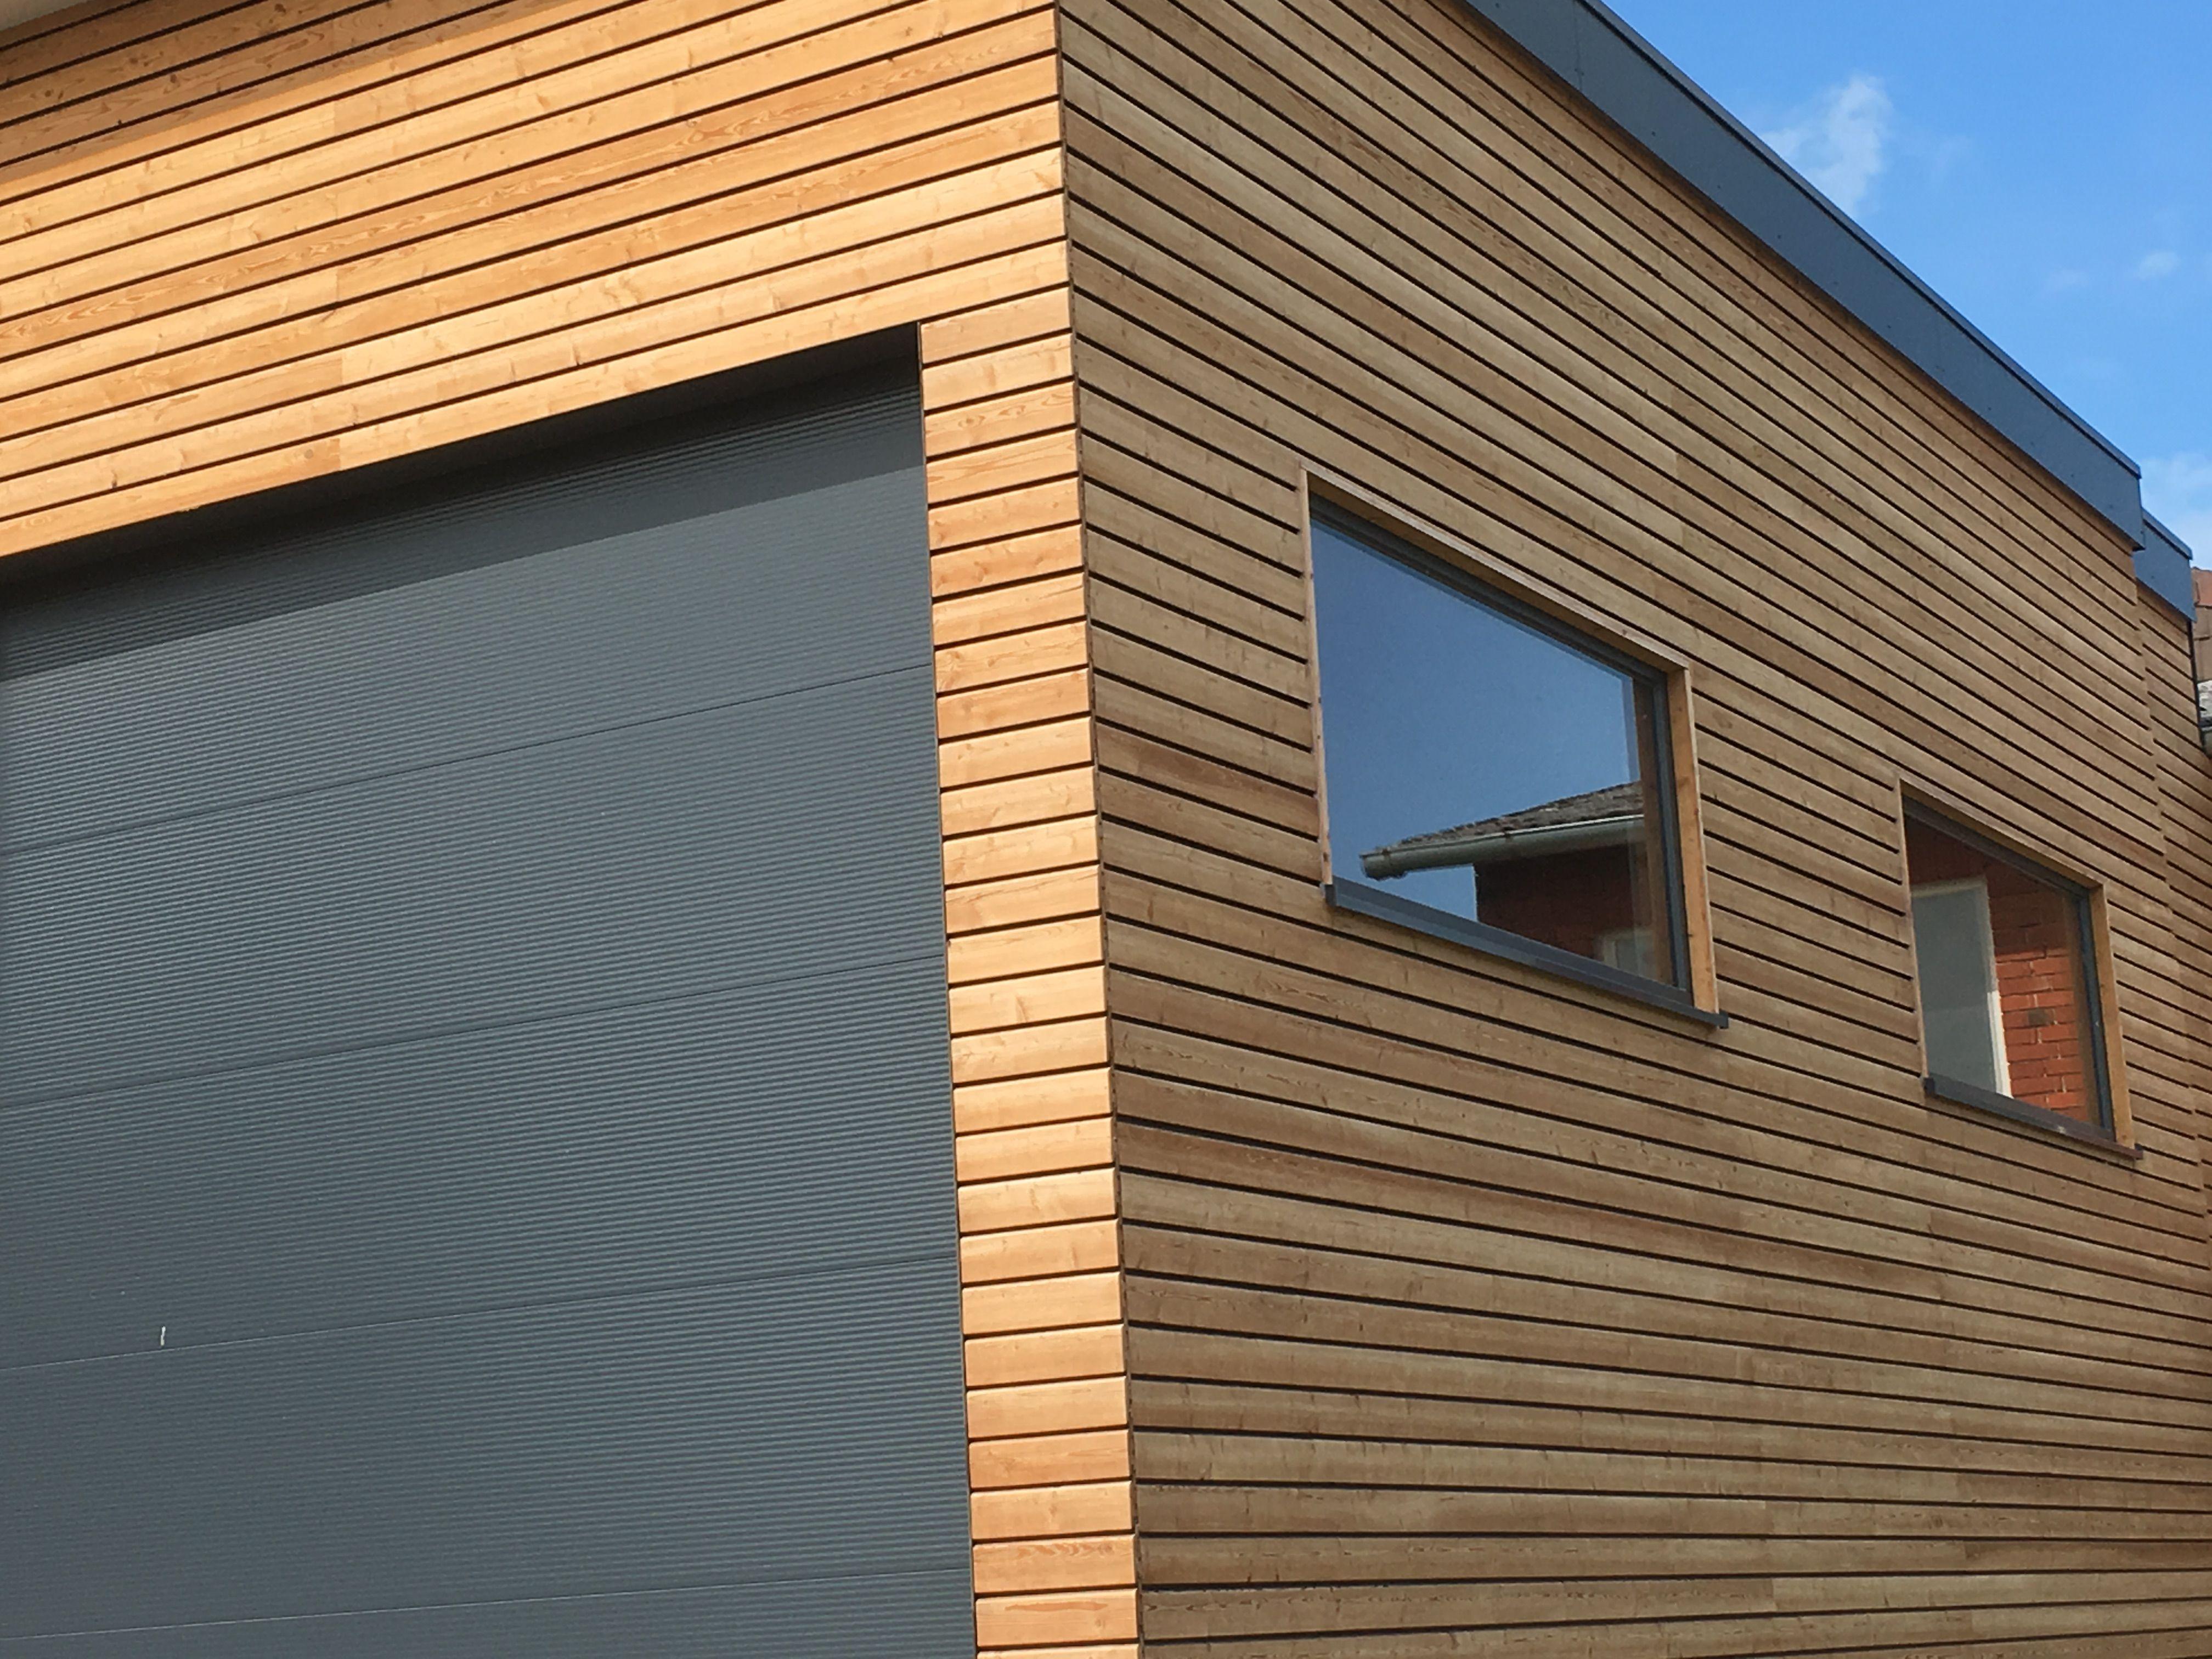 gallery of holzfassade sib larche holzfassade wood cladding